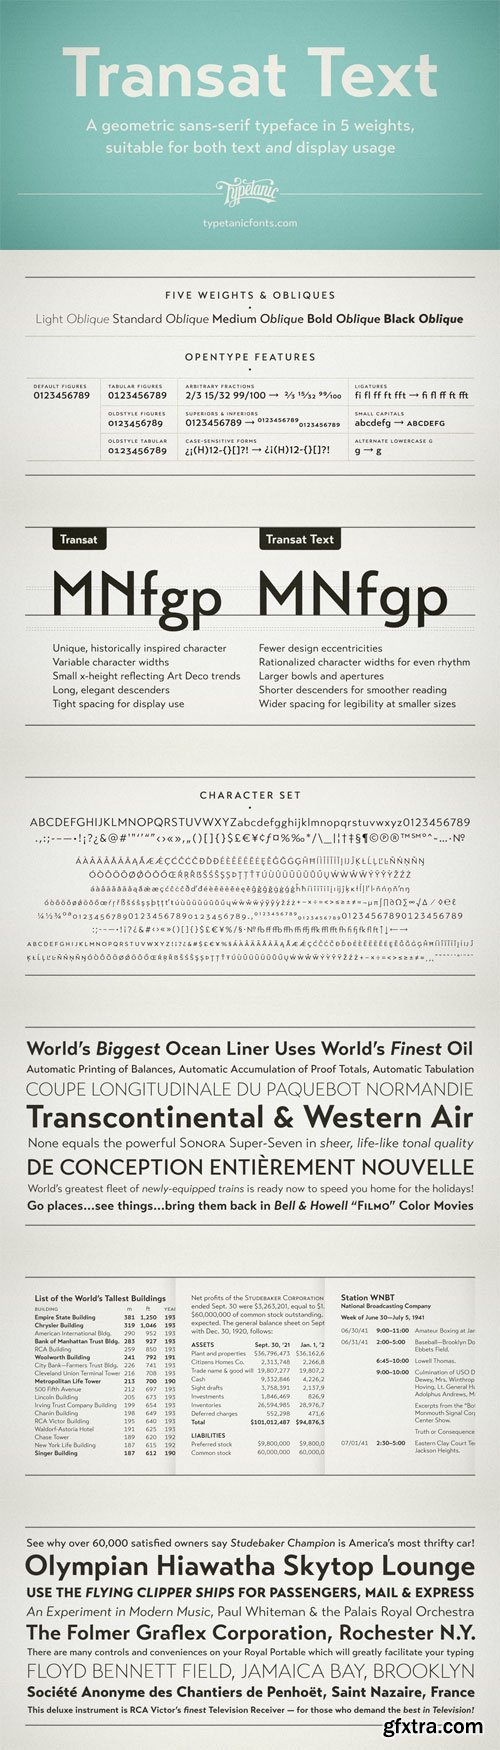 Transat Text Font Family - 10 Fonts for $72